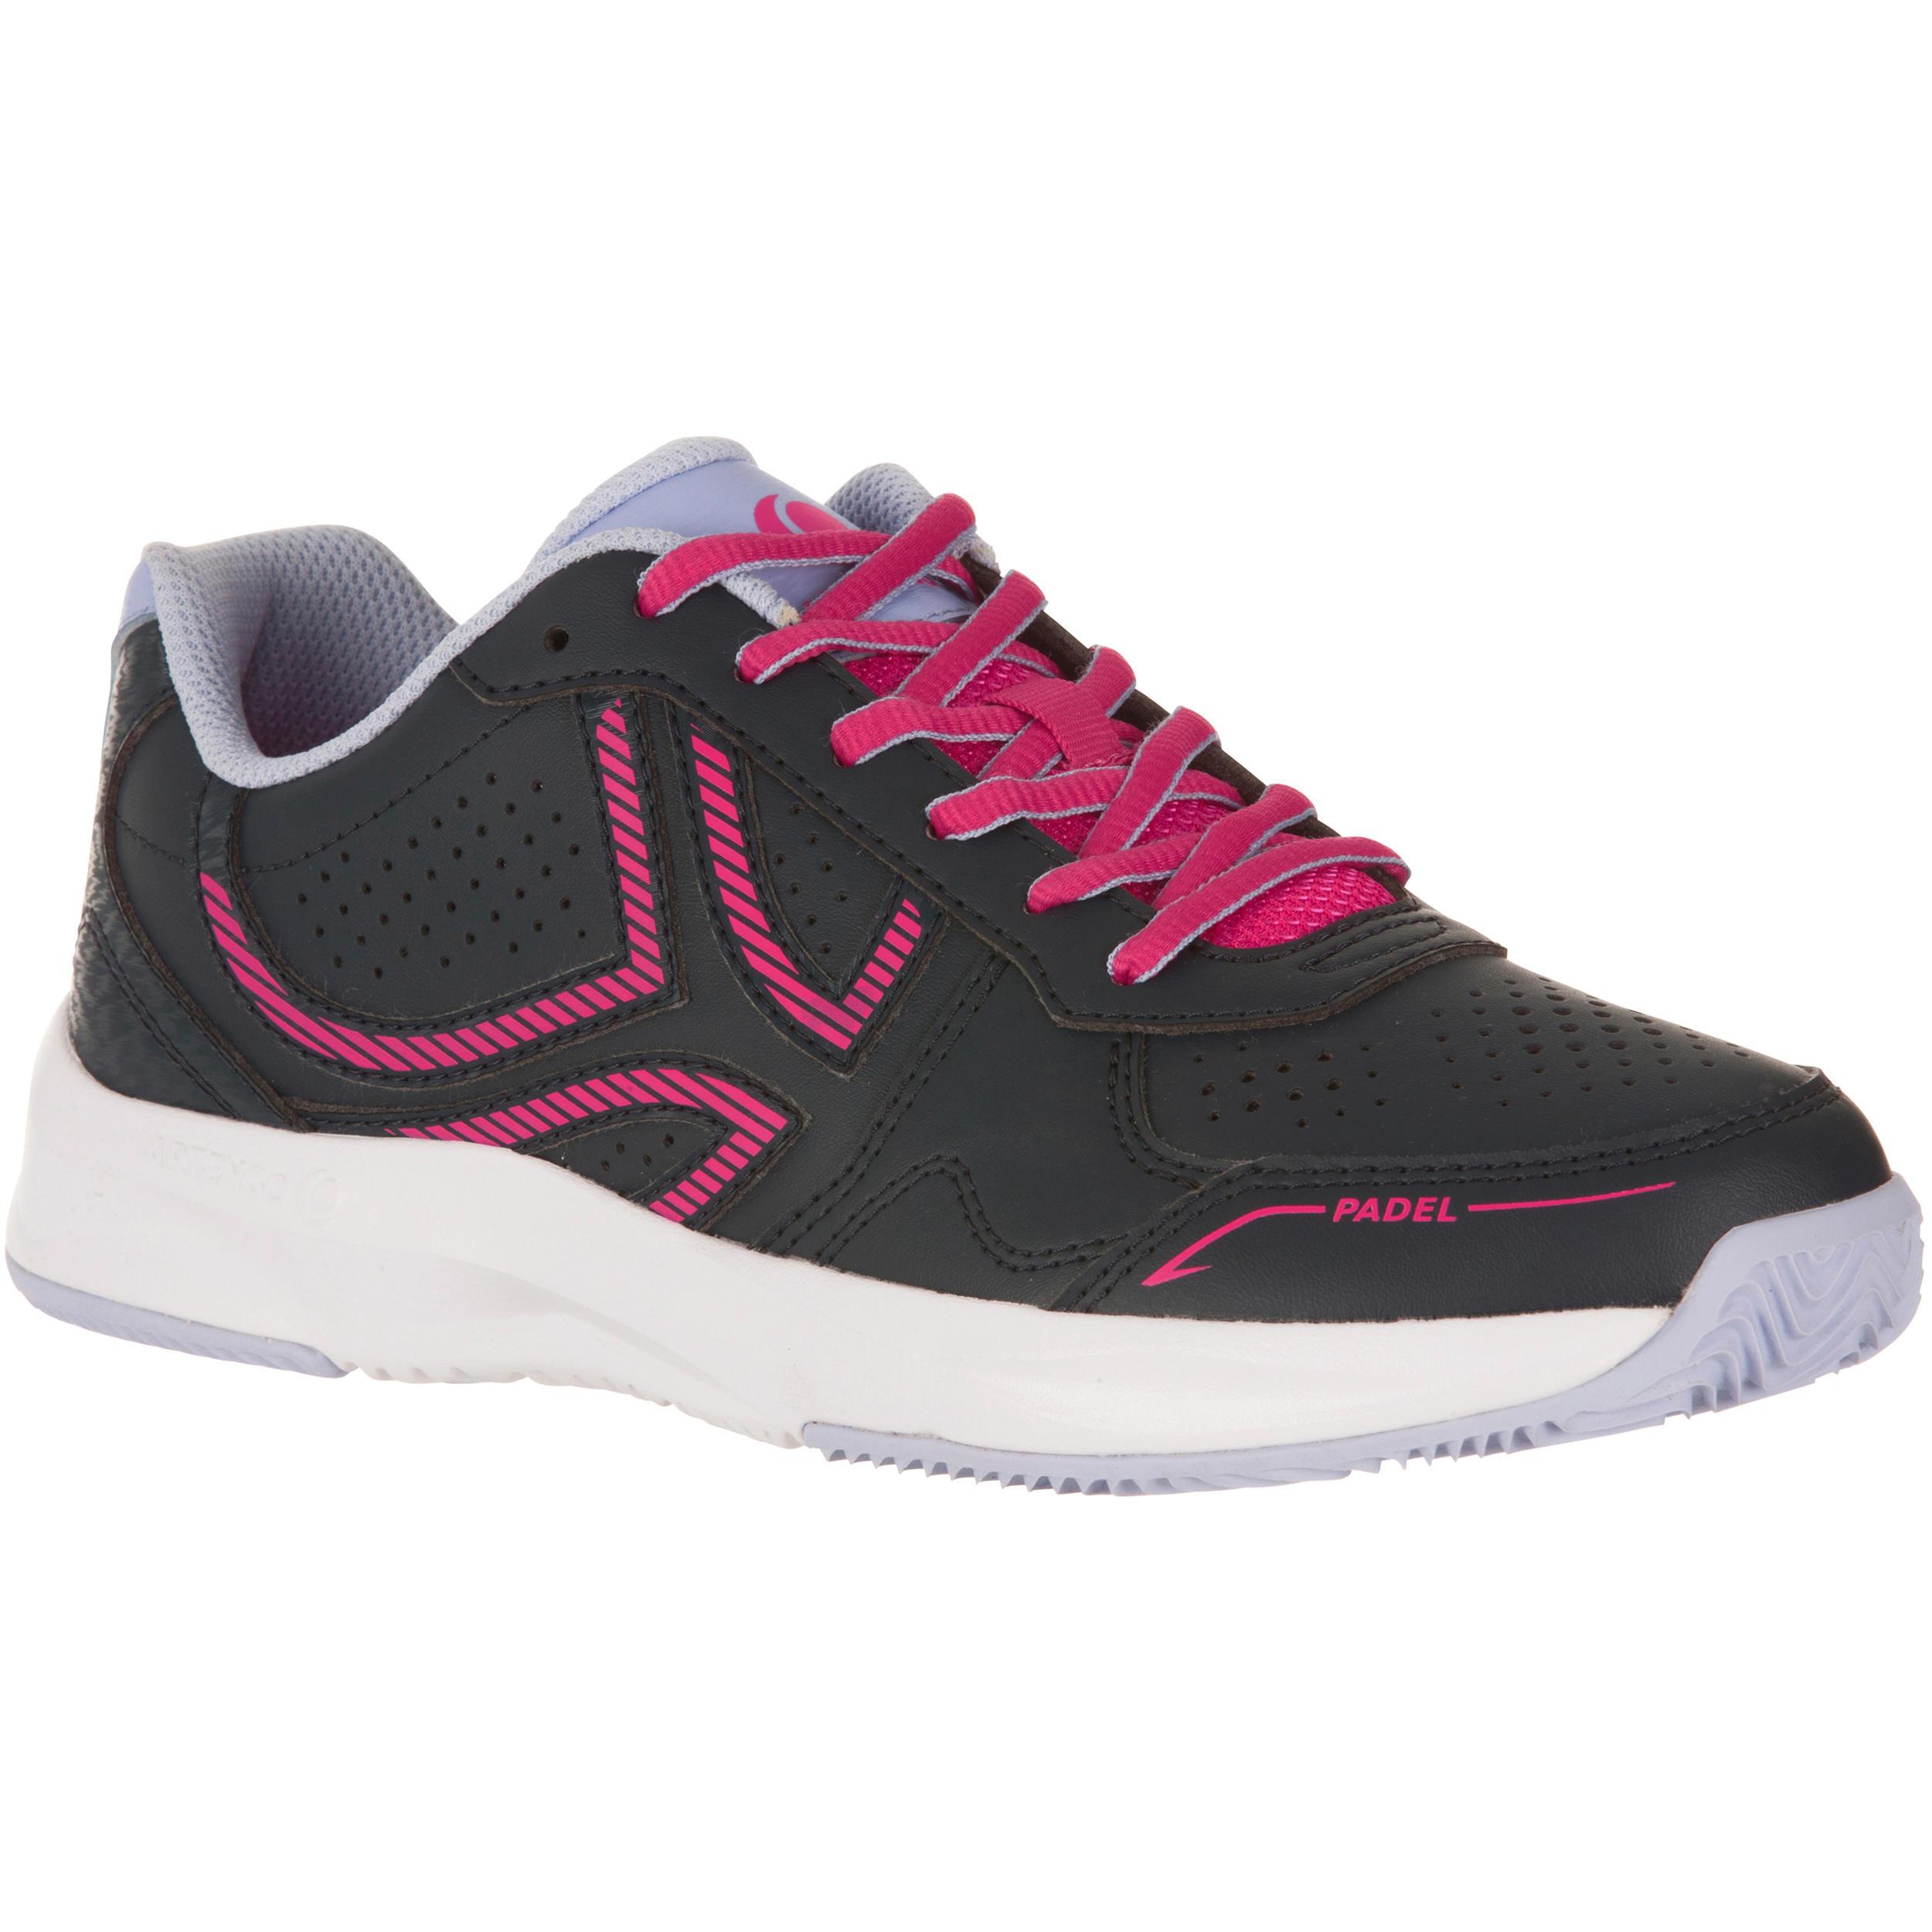 Tenis de pádel Mujer PS830 Azul marino / Rosa